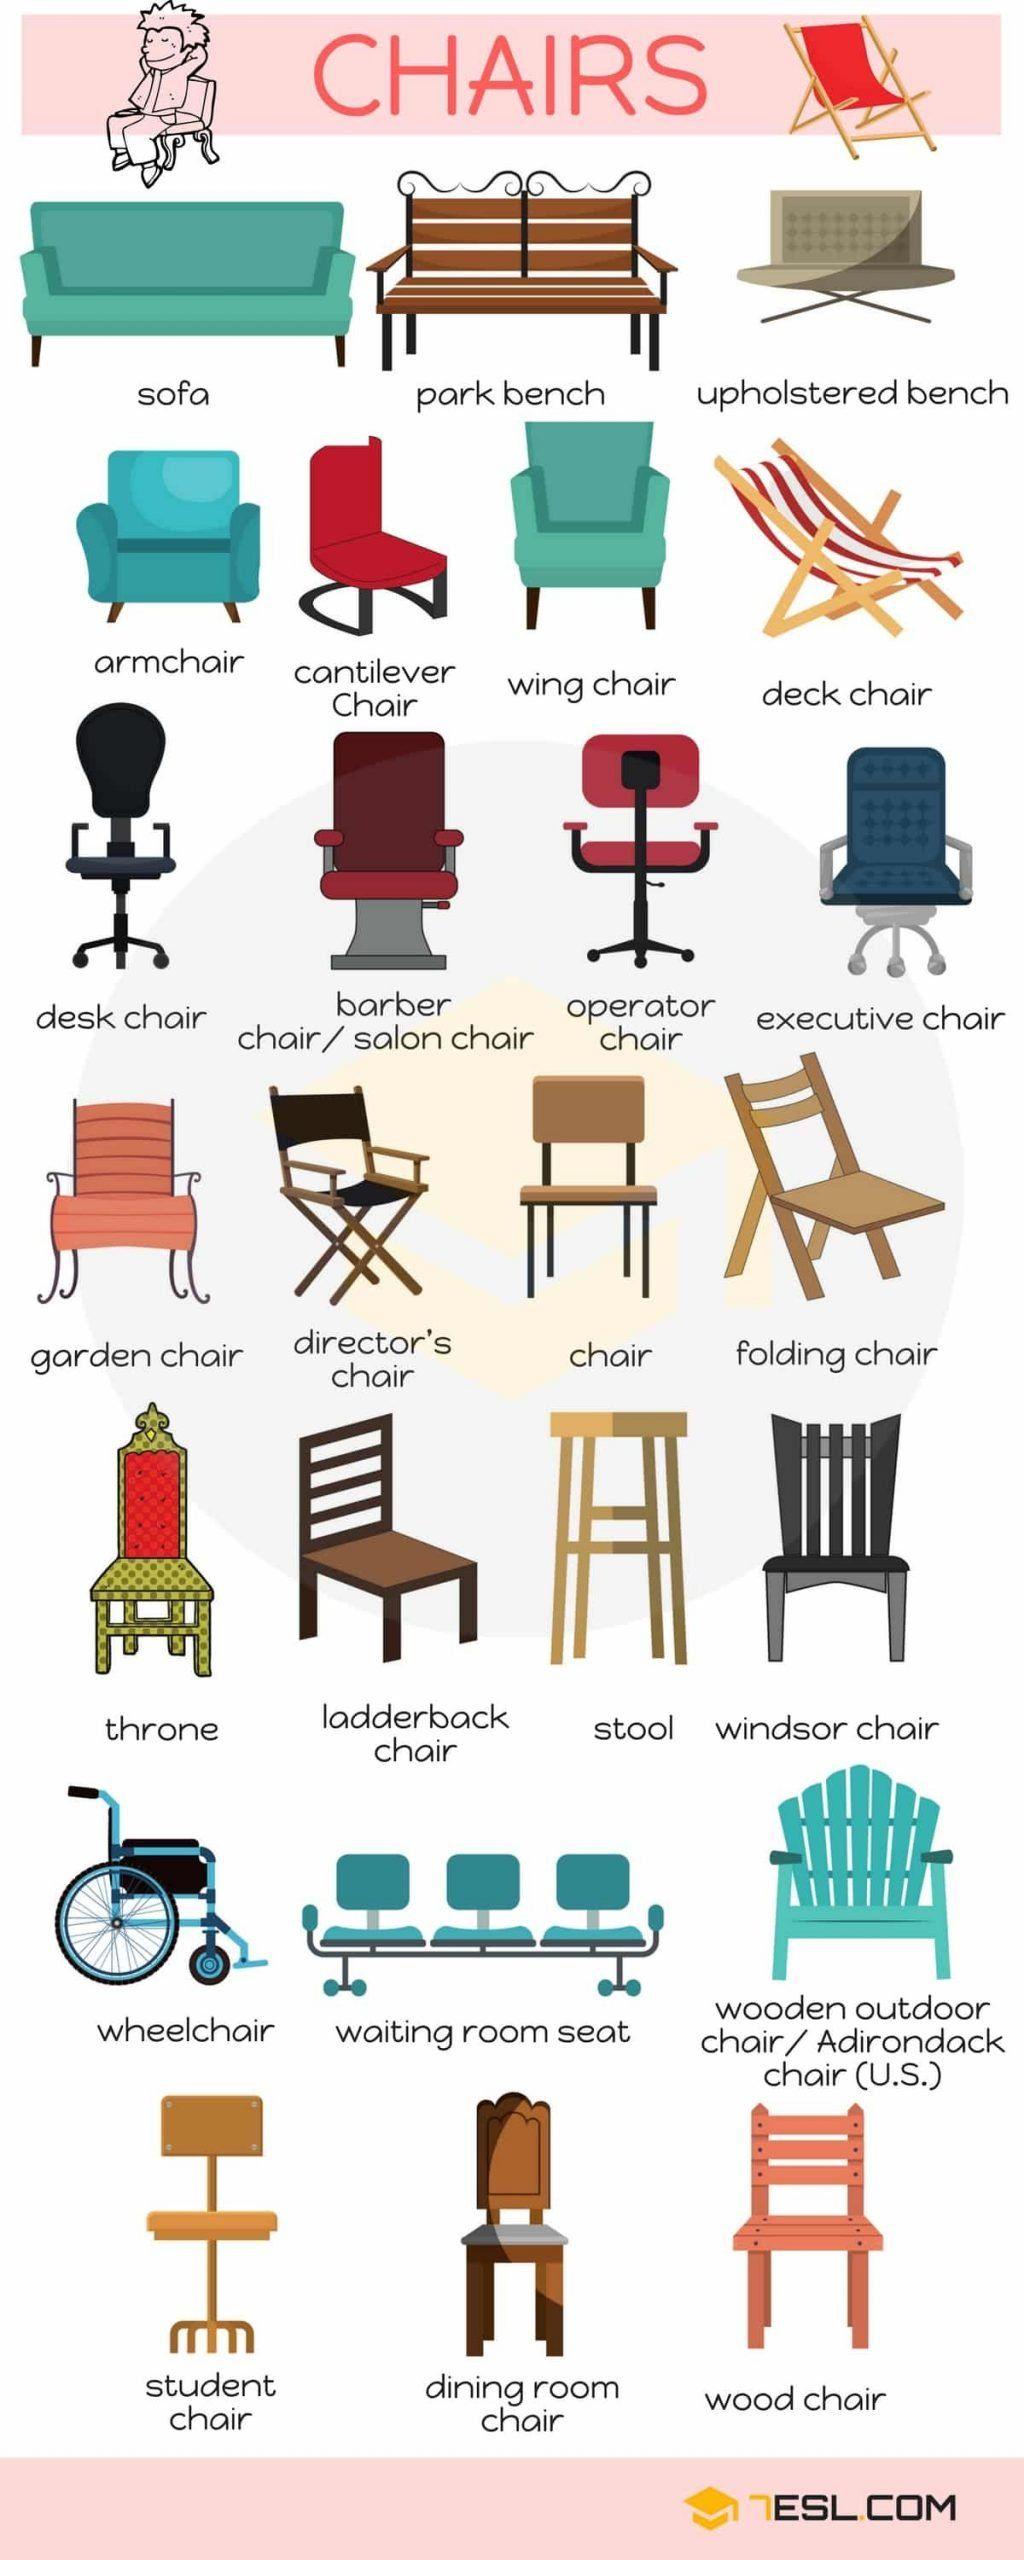 Names Of Living Room Furniture Beautiful 9d89 Living Room Furniture Names In English In 2020 English Vocabulary Learn English Vocabulary English Language Teaching